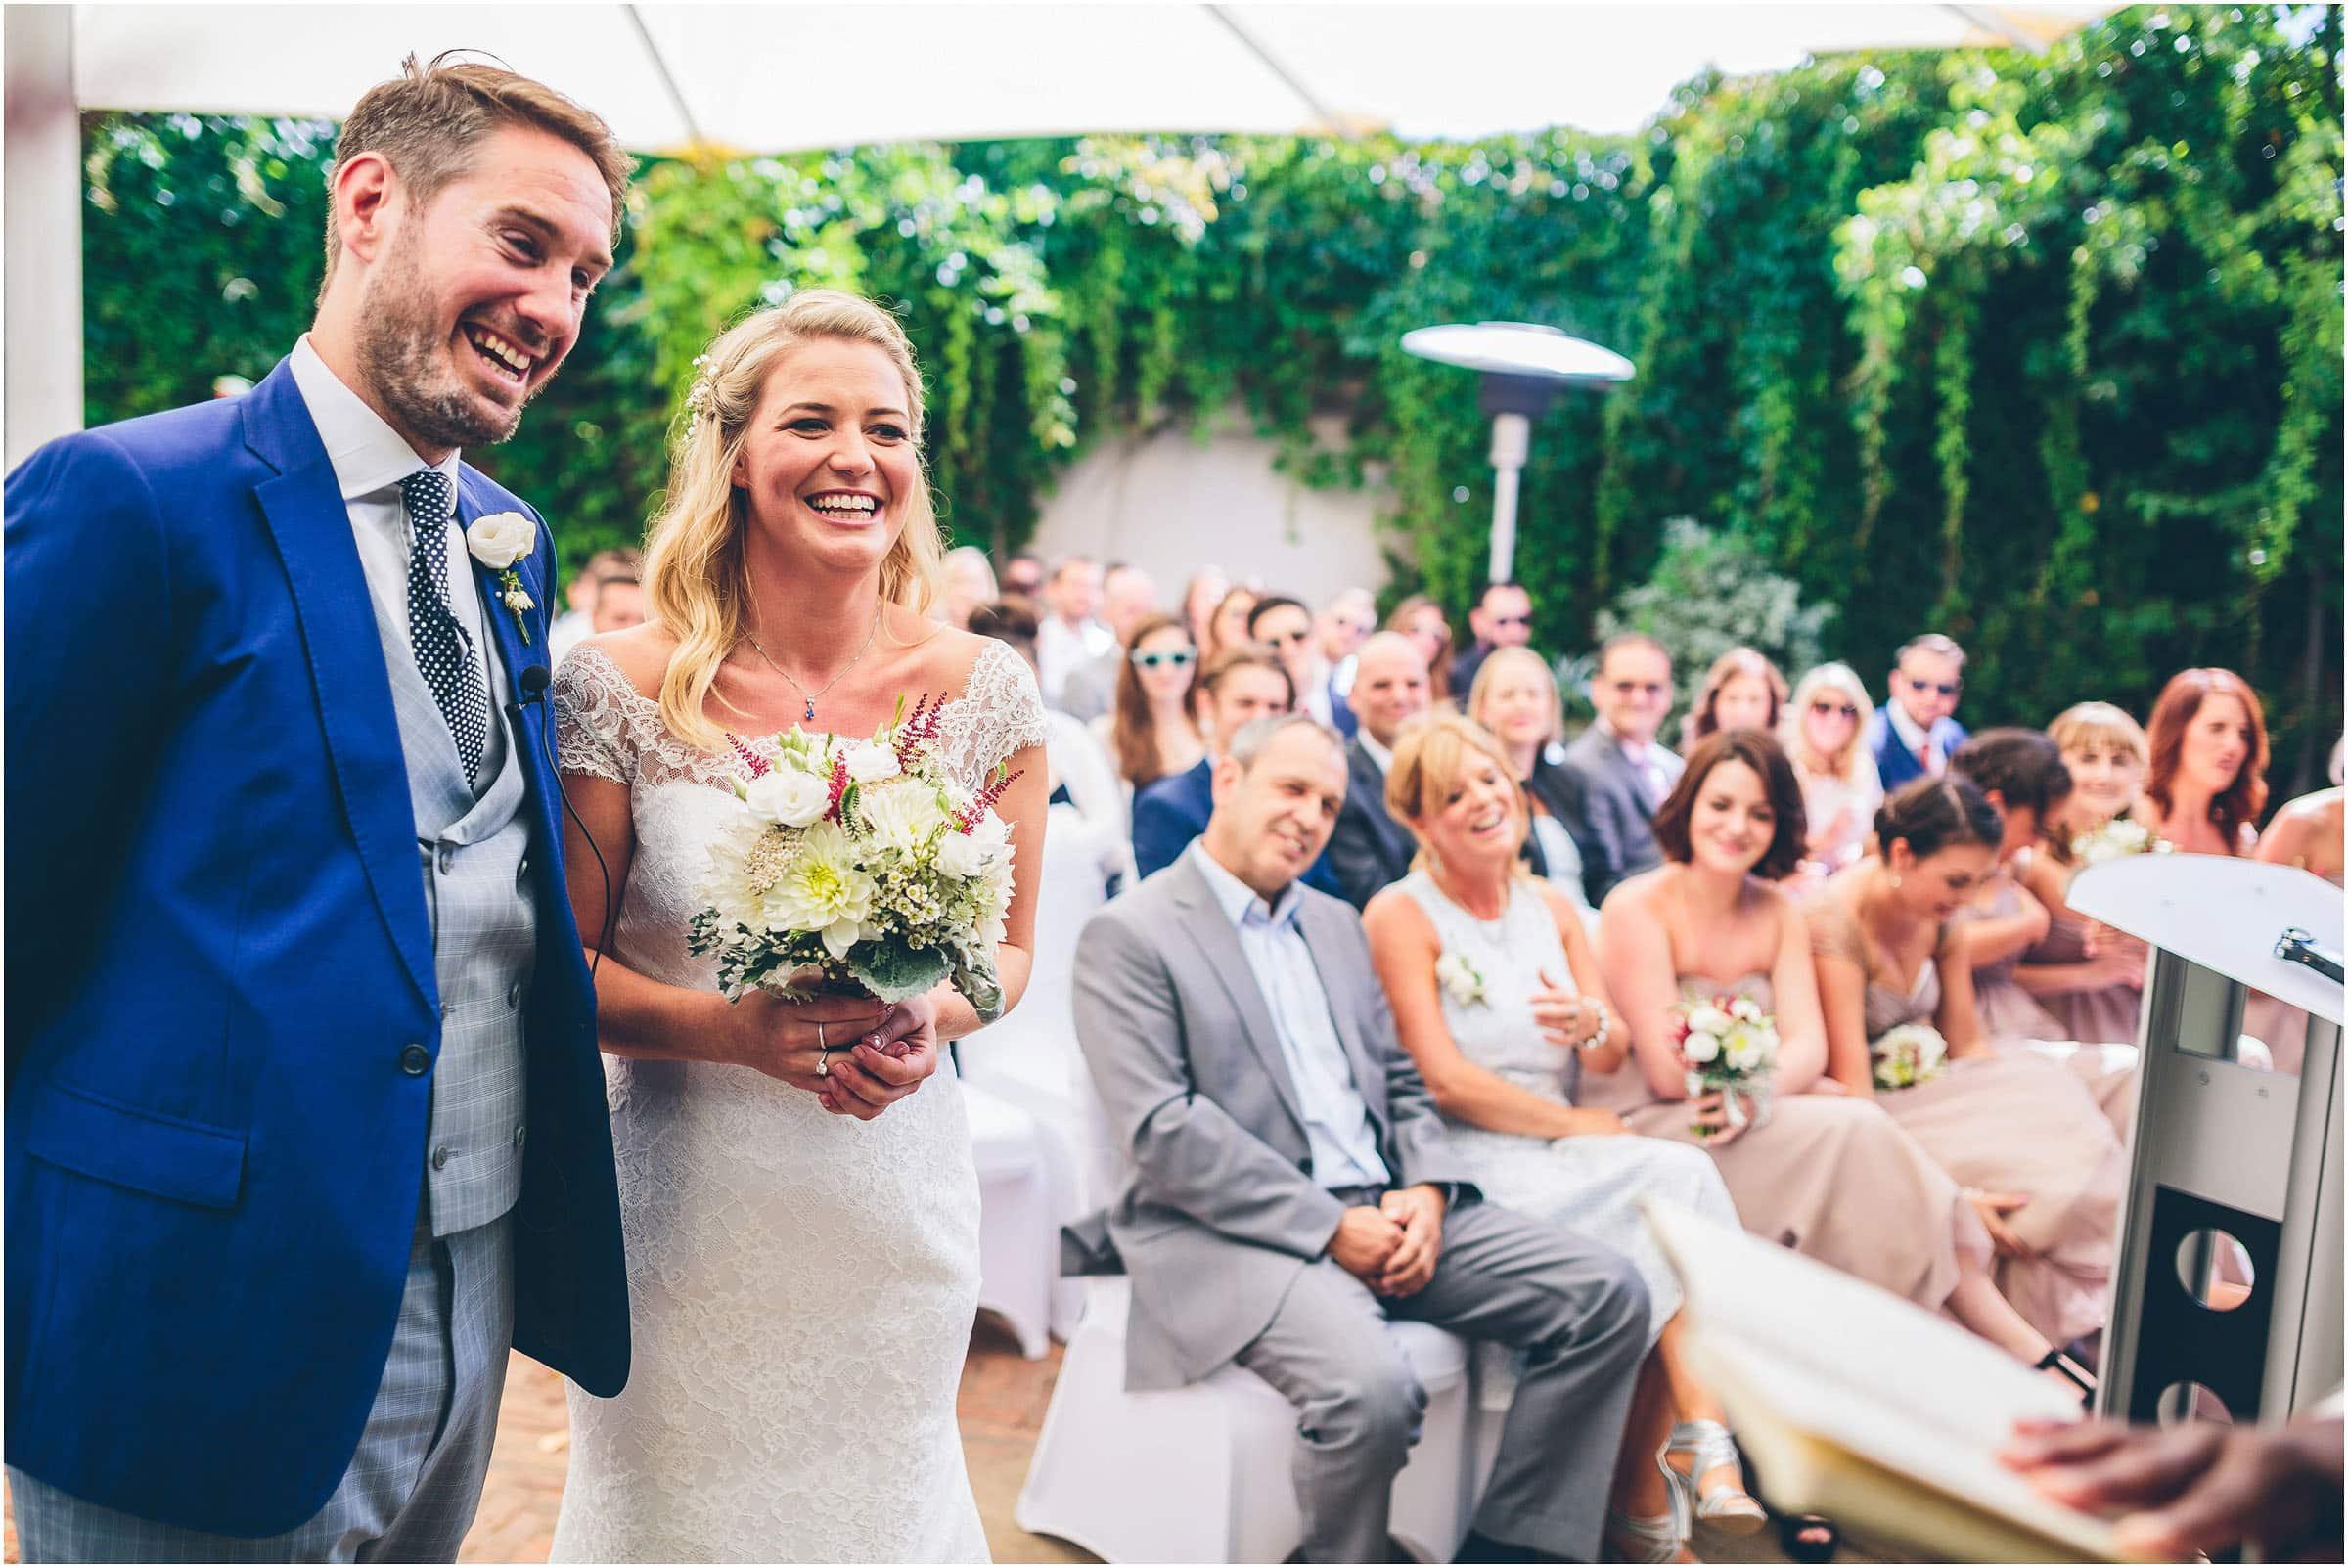 Kensington_Roof_Gardens_Wedding_Photography_0034